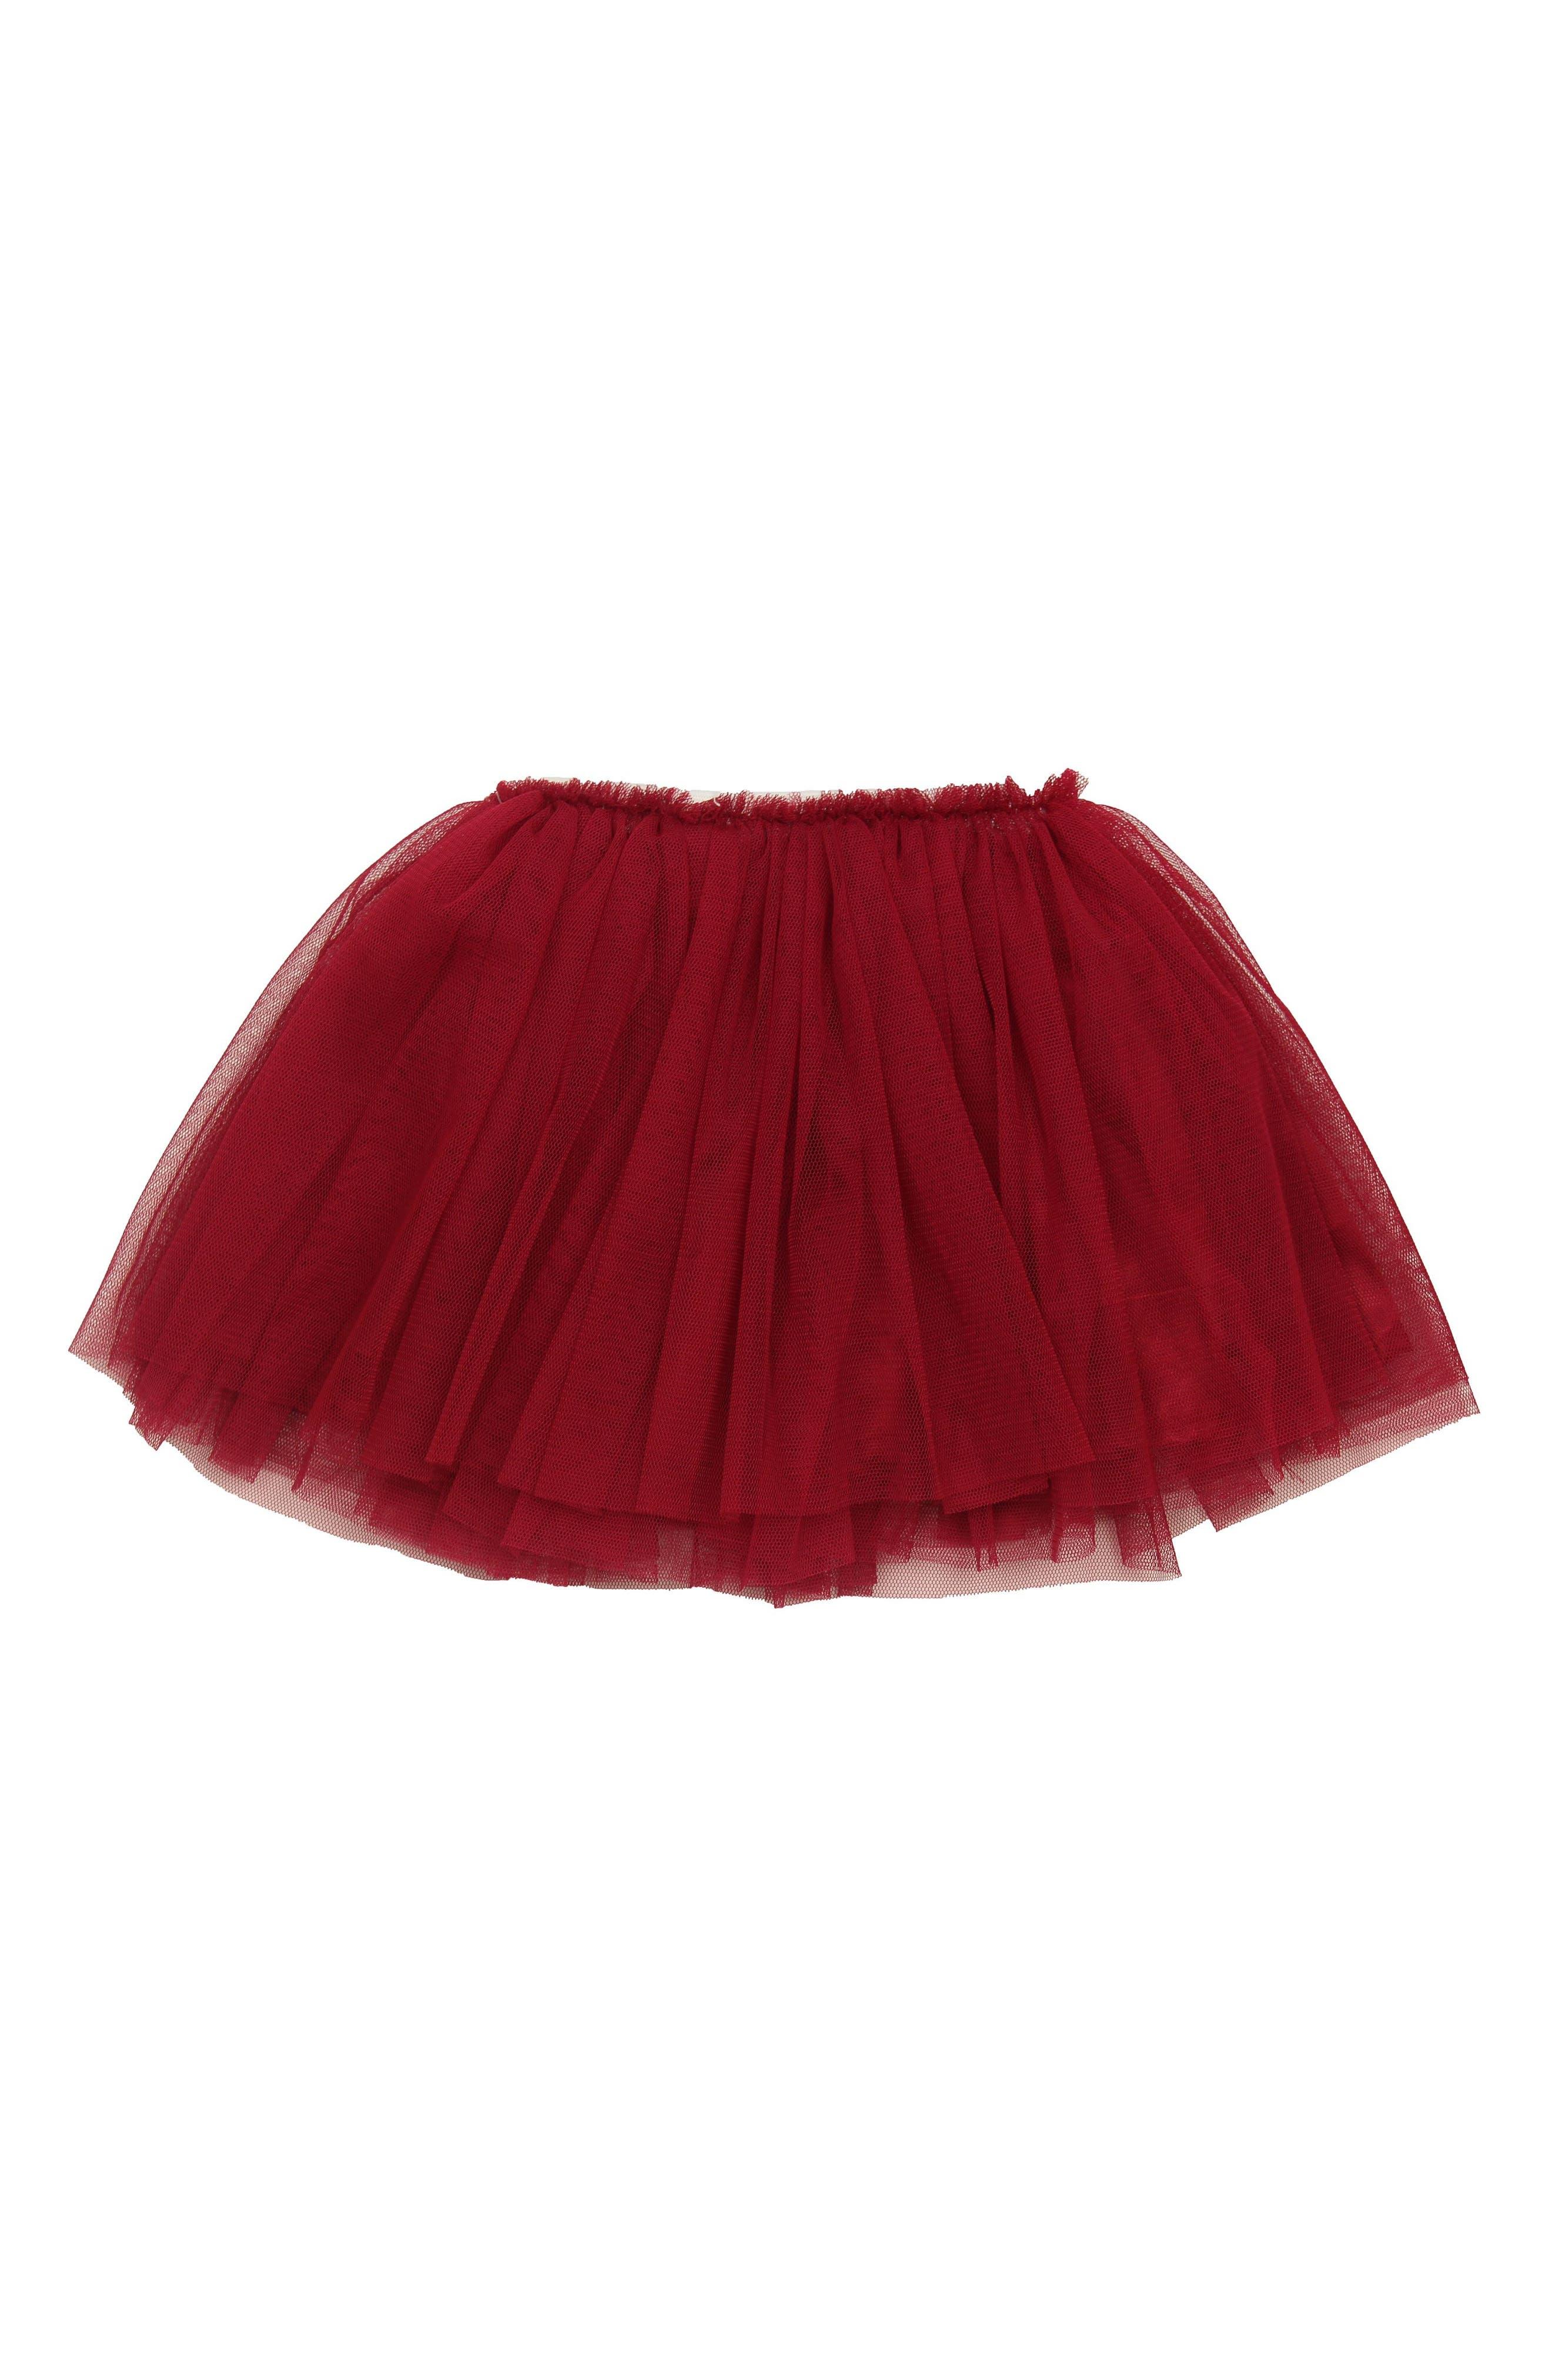 Tutu Skirt,                             Main thumbnail 1, color,                             BURGUNDY